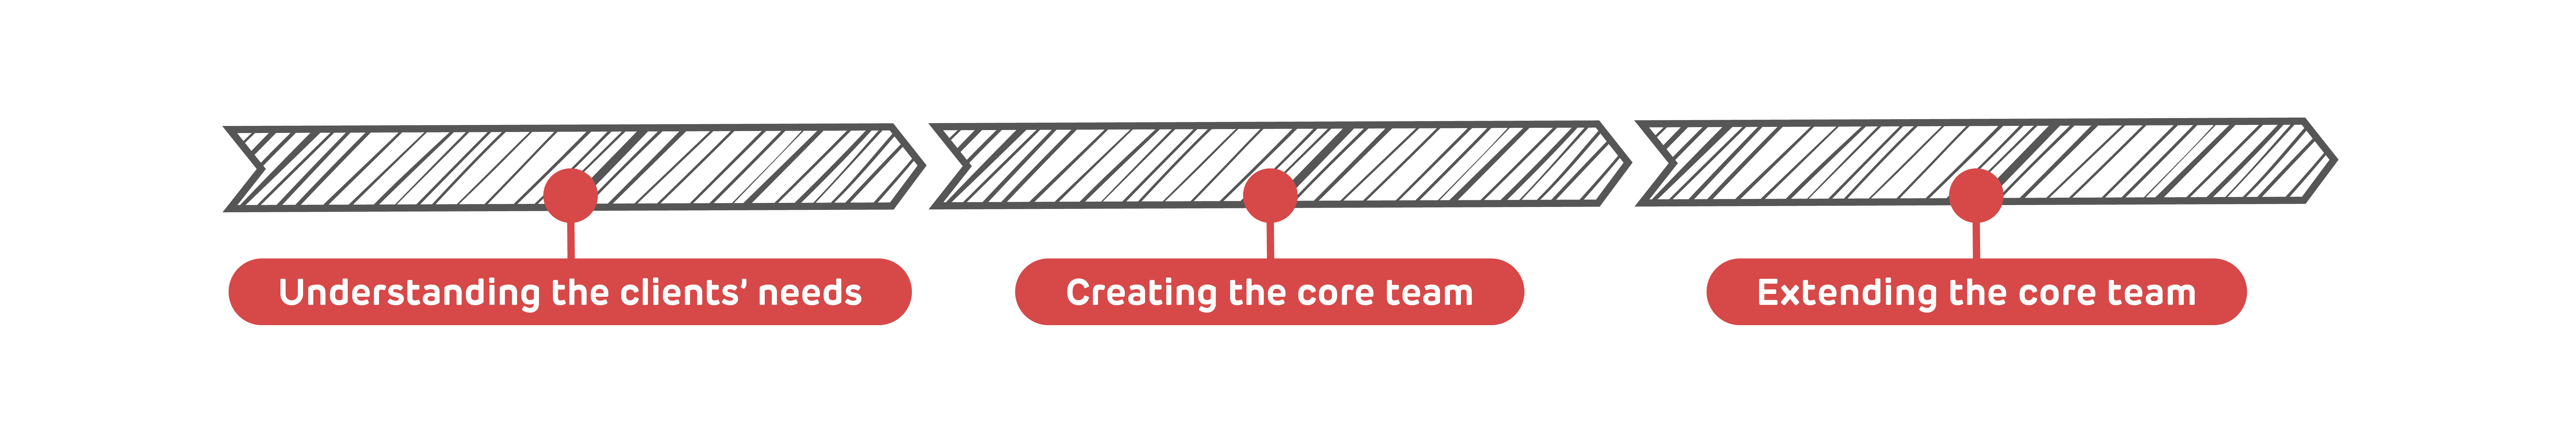 wirtek-dedicated-team-process